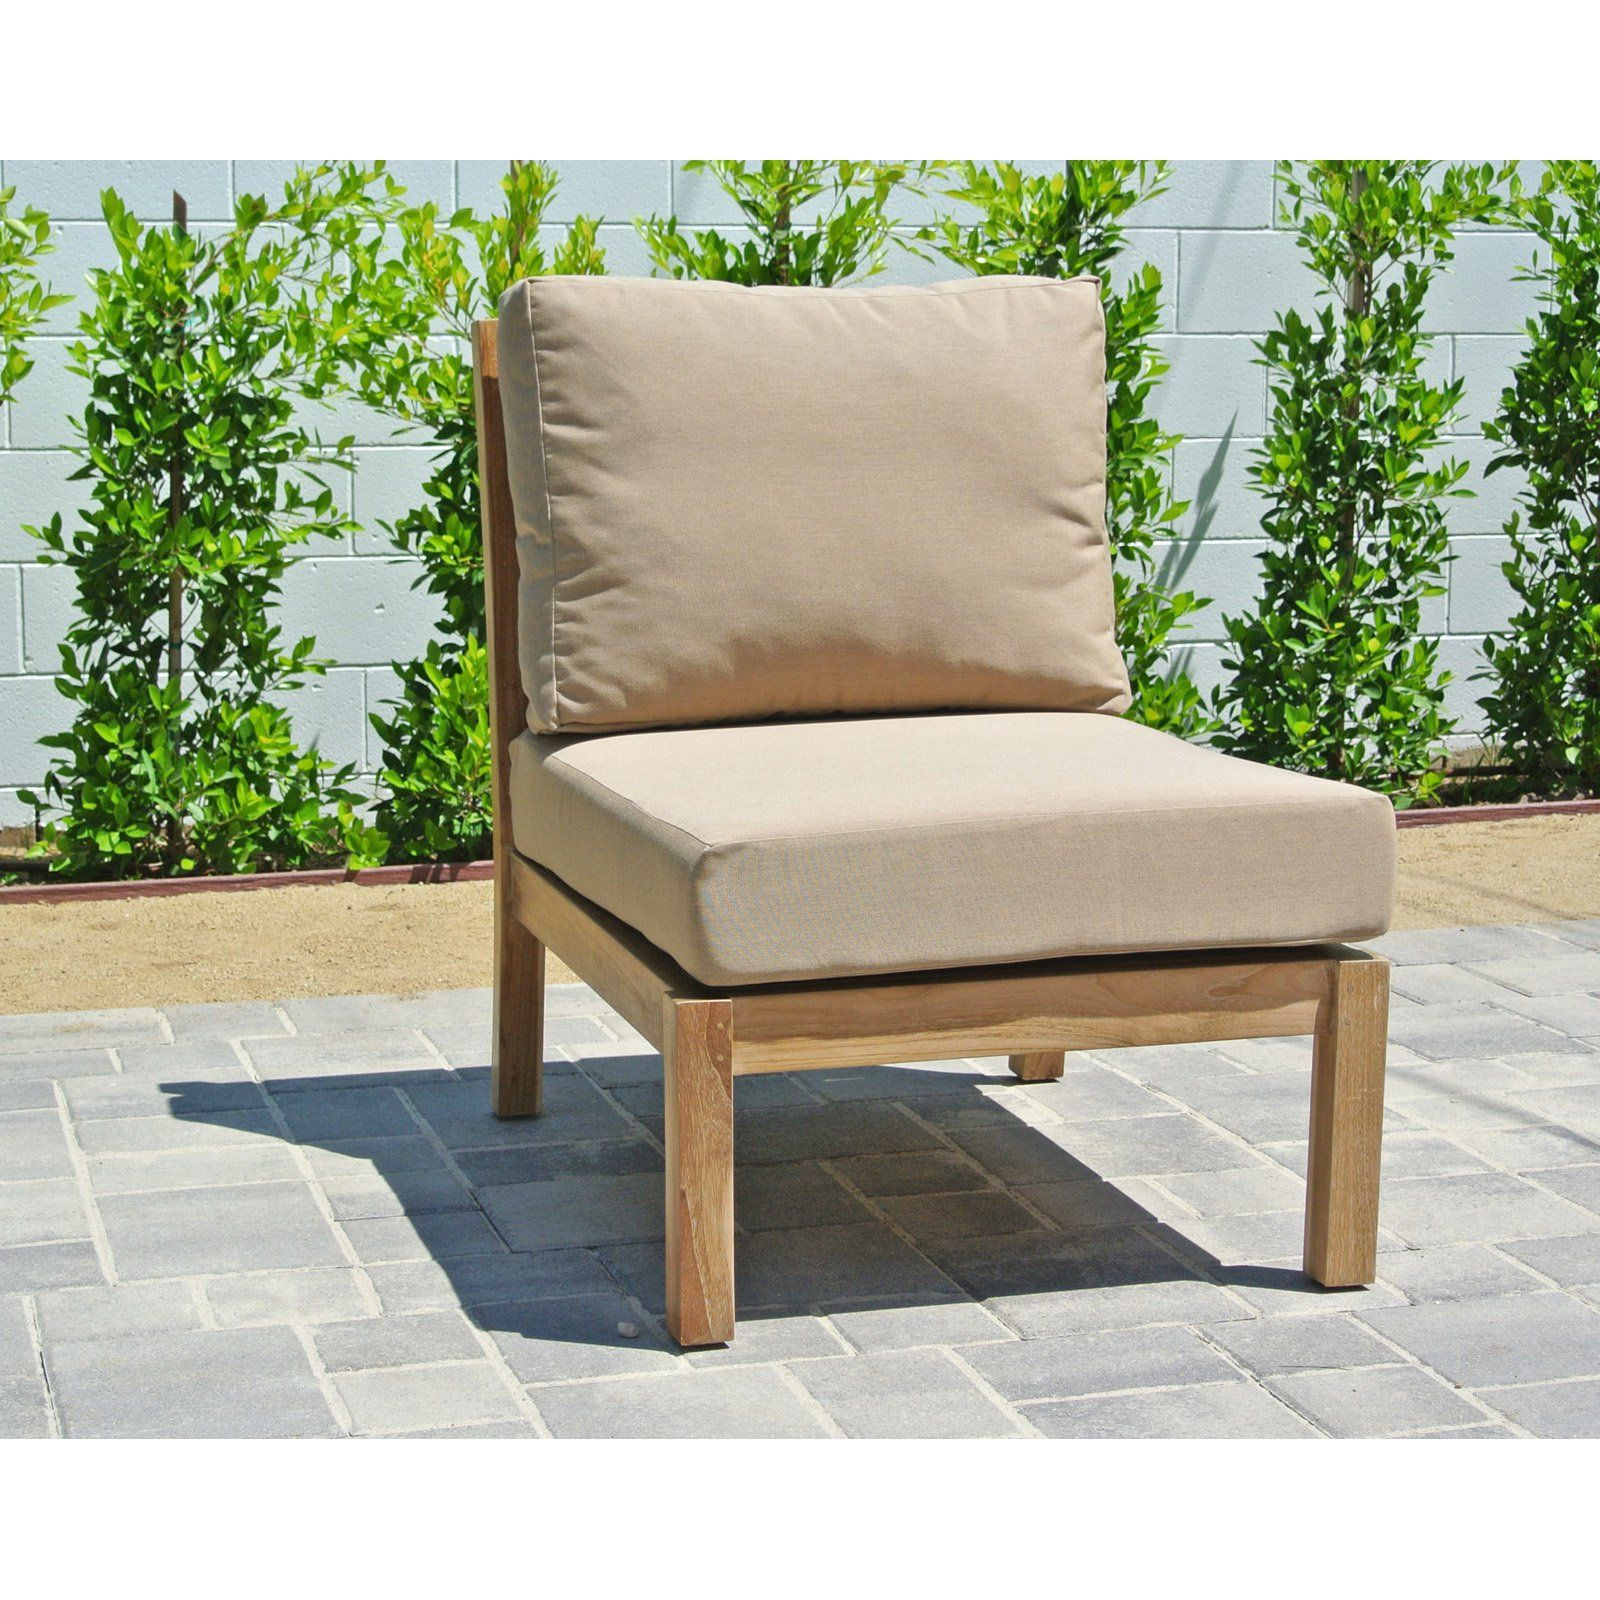 Willow Creek Huntington Teak Outdoor Armless Sectional Piece Brannon Redwood Sunbrella Cushions Teak Outdoor Furniture